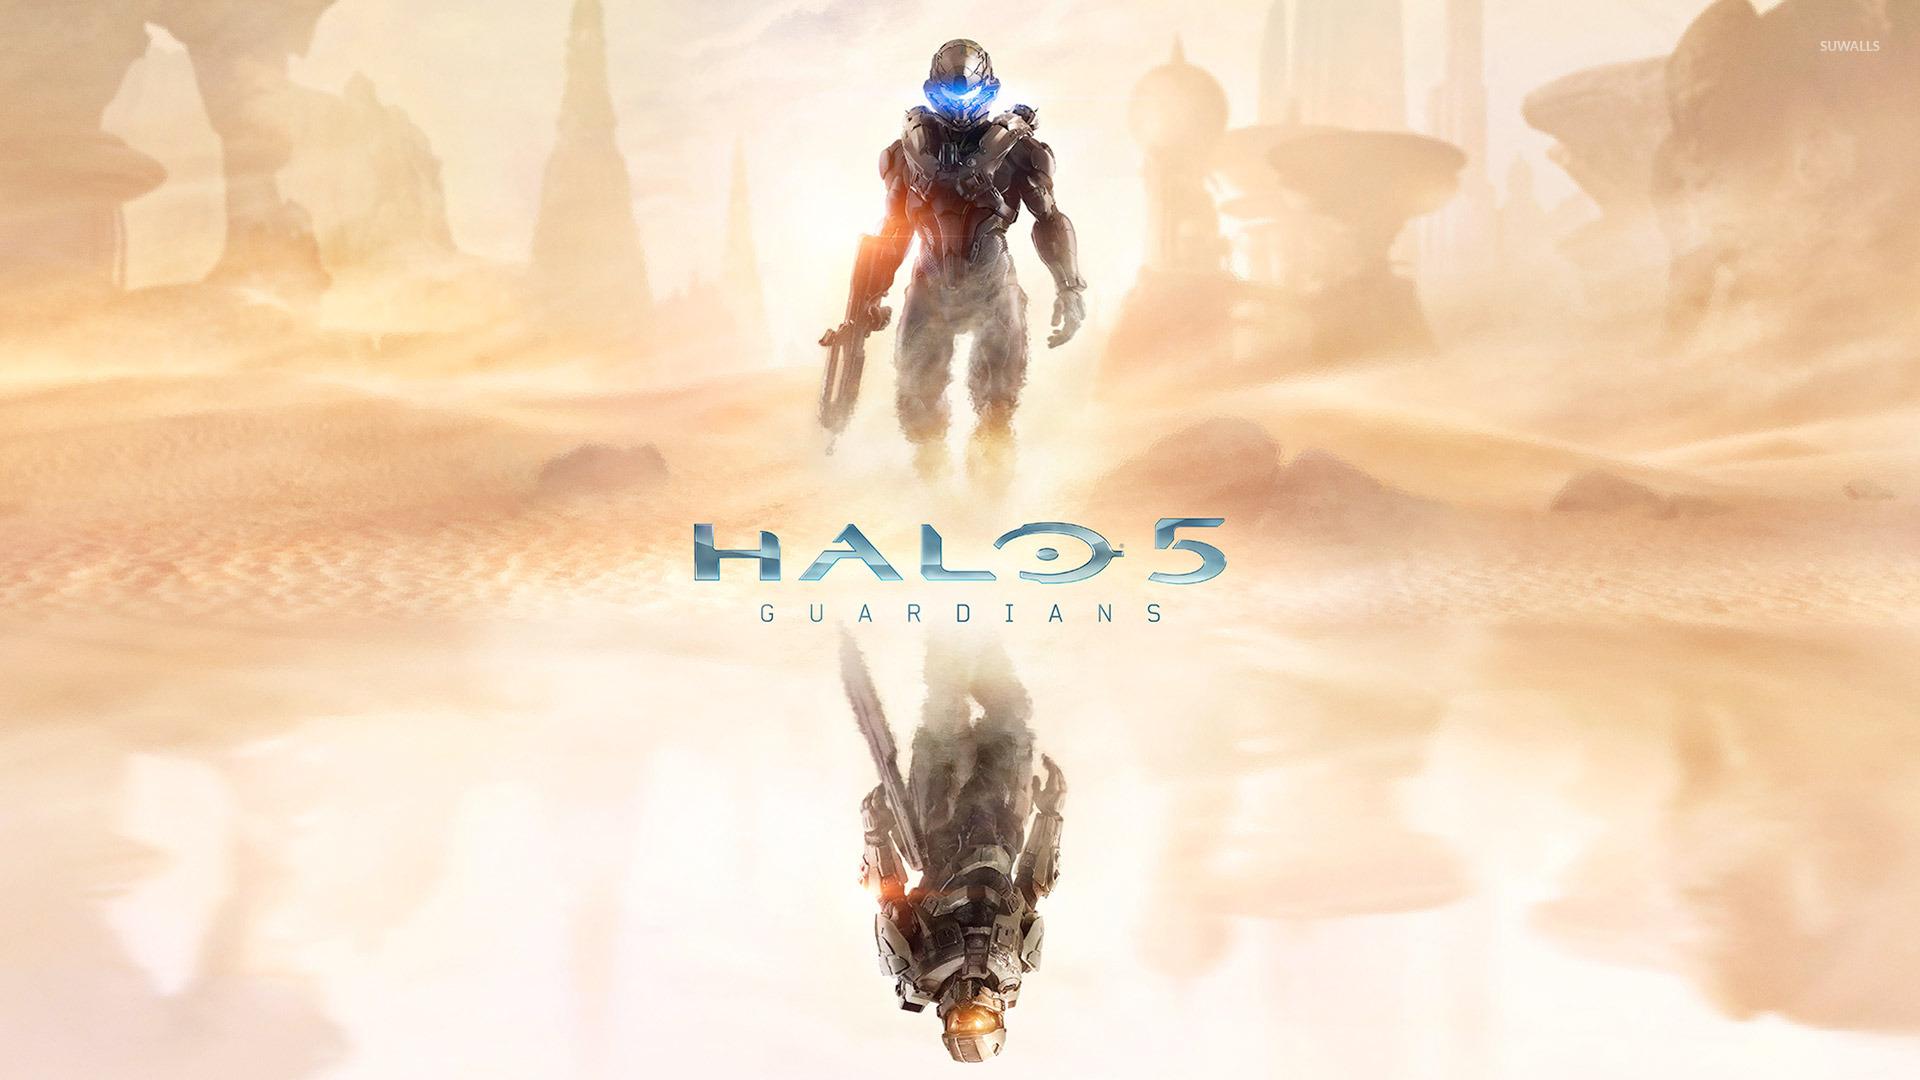 halo 5 guardians download